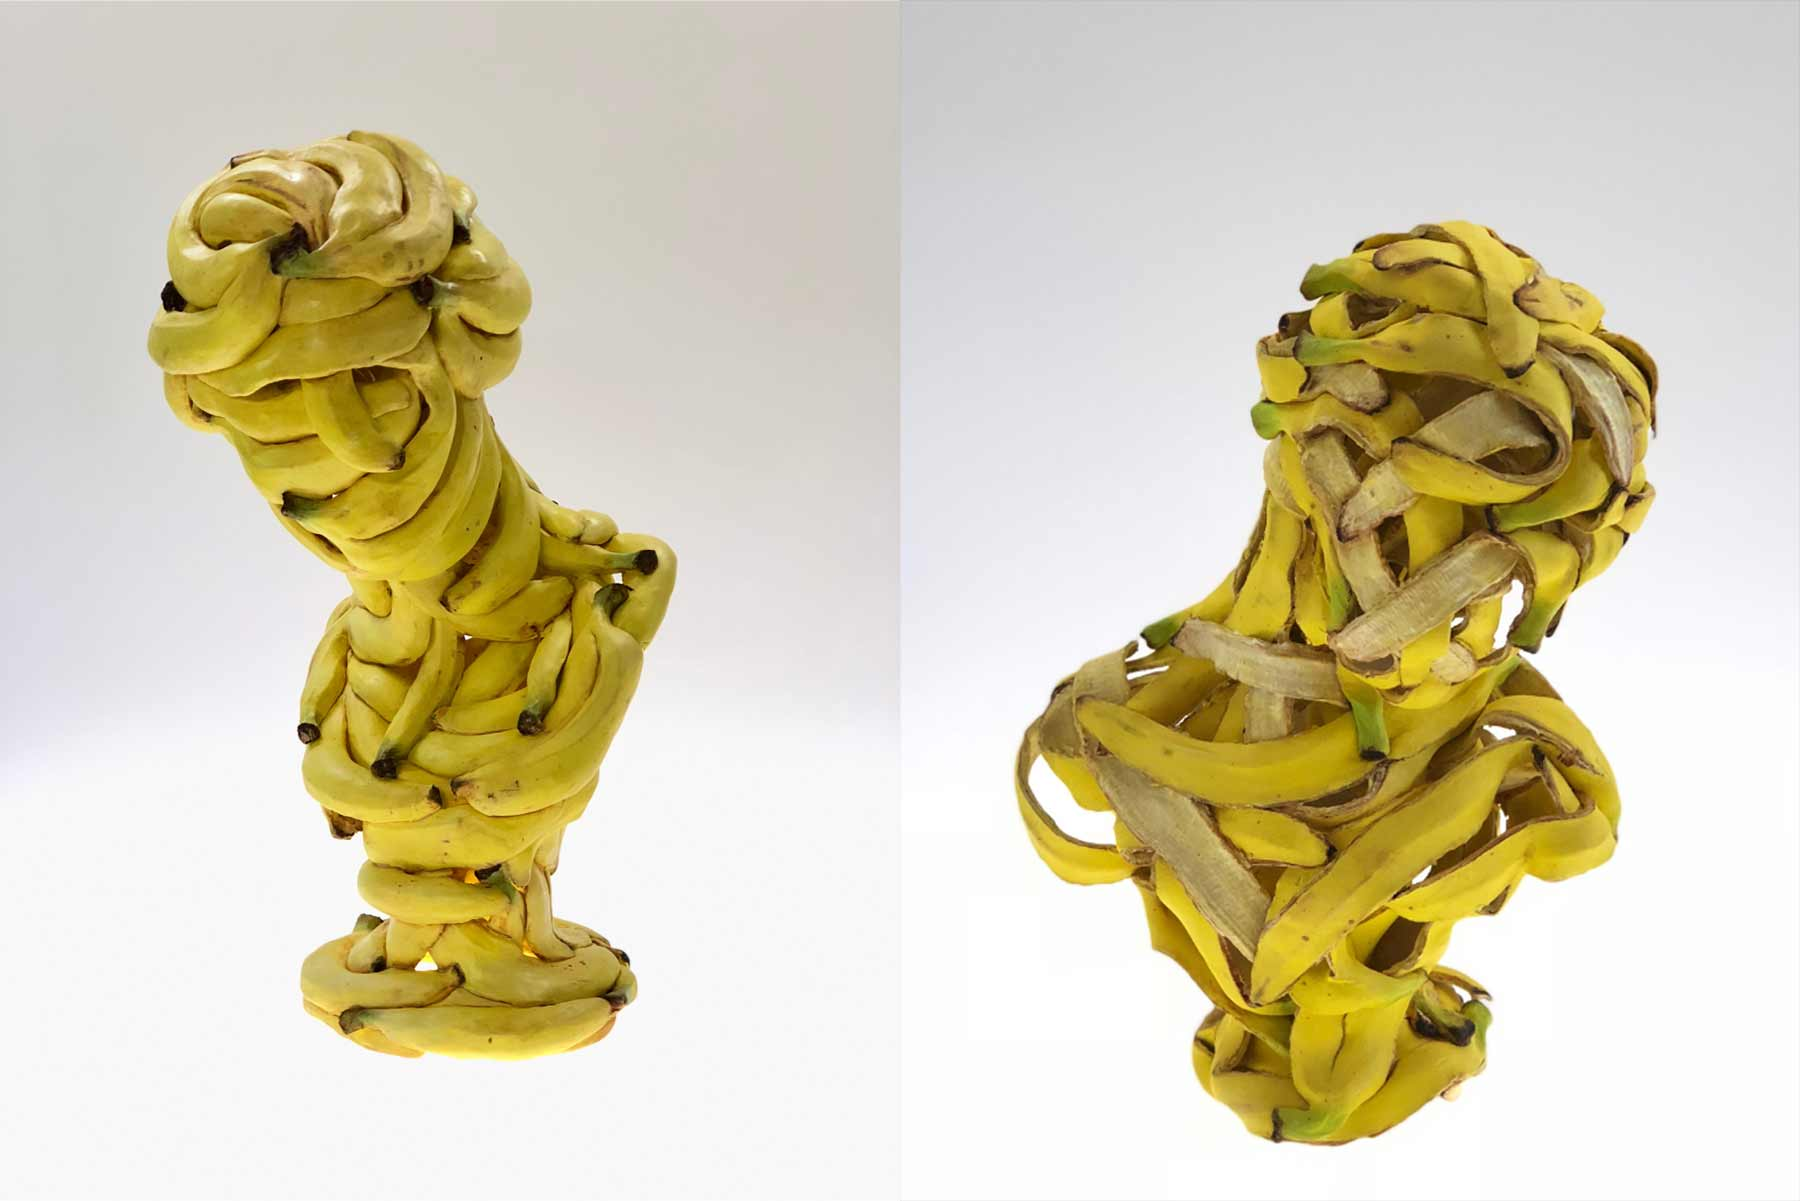 Bananen-Skulpturen von Koji Kasatani